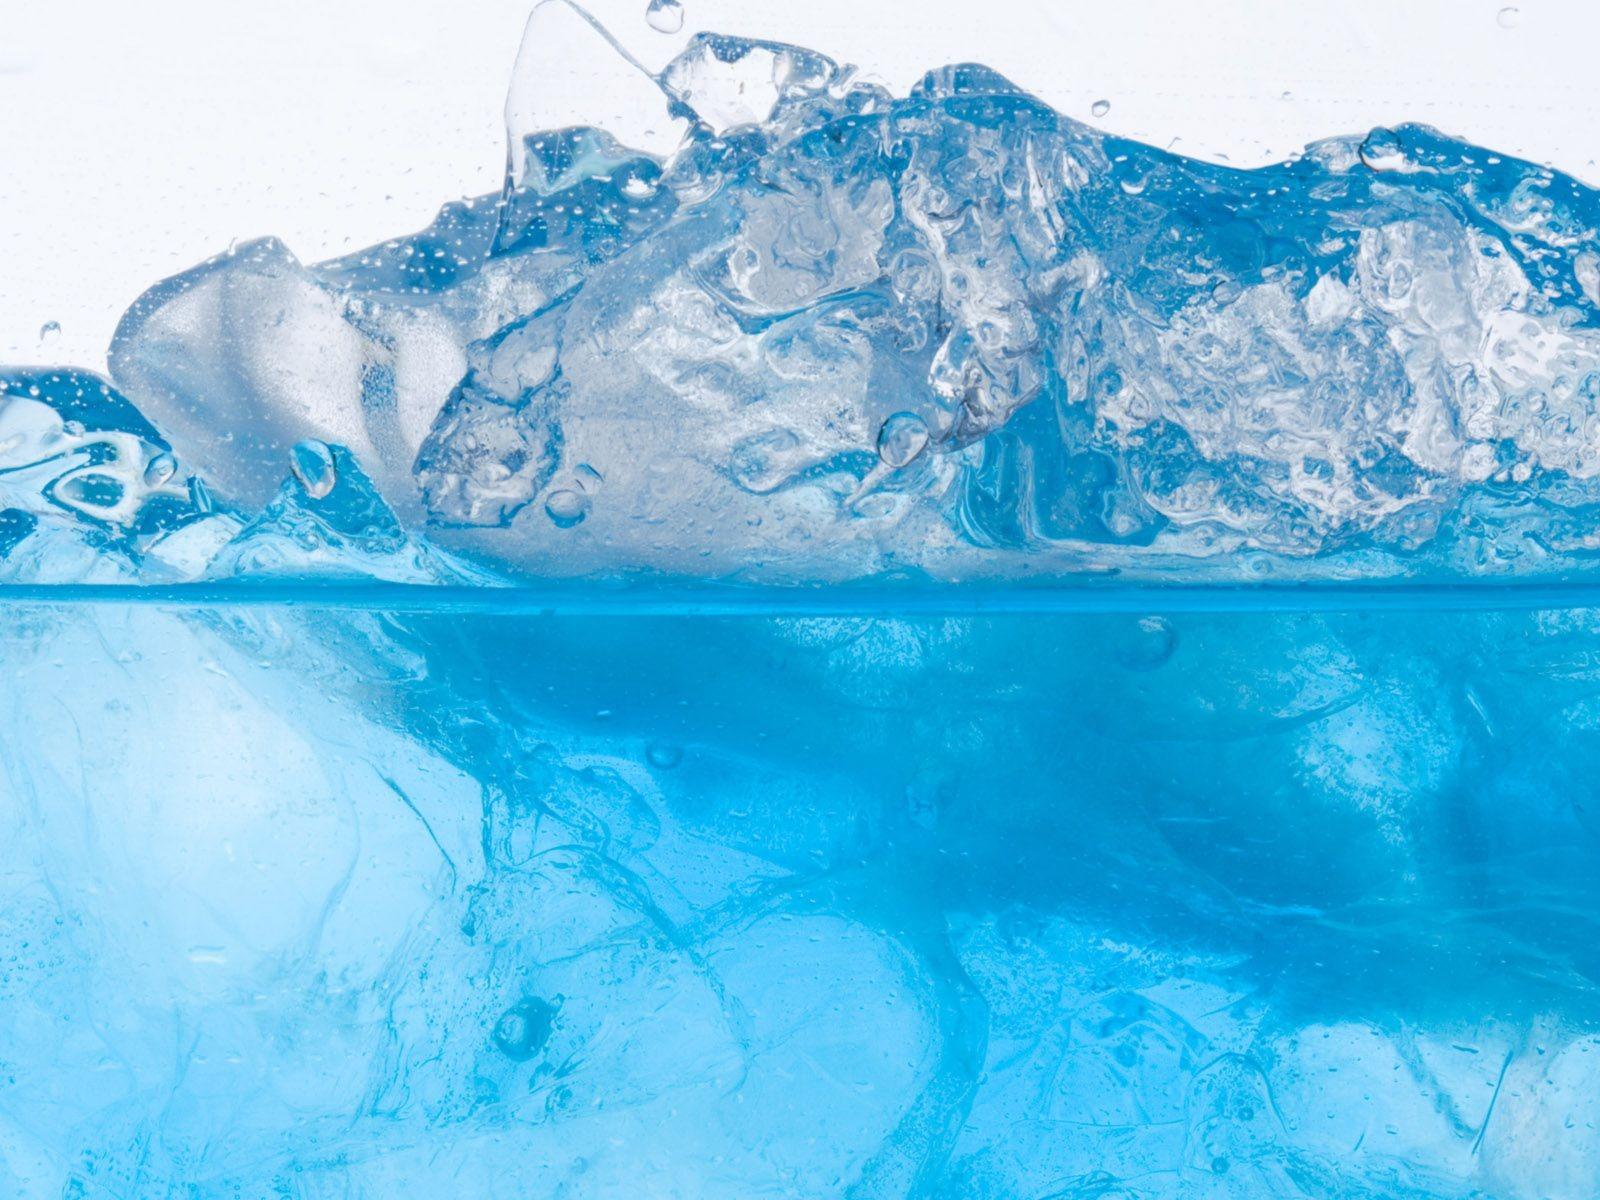 Fond d'ecran Glace eau fraiche